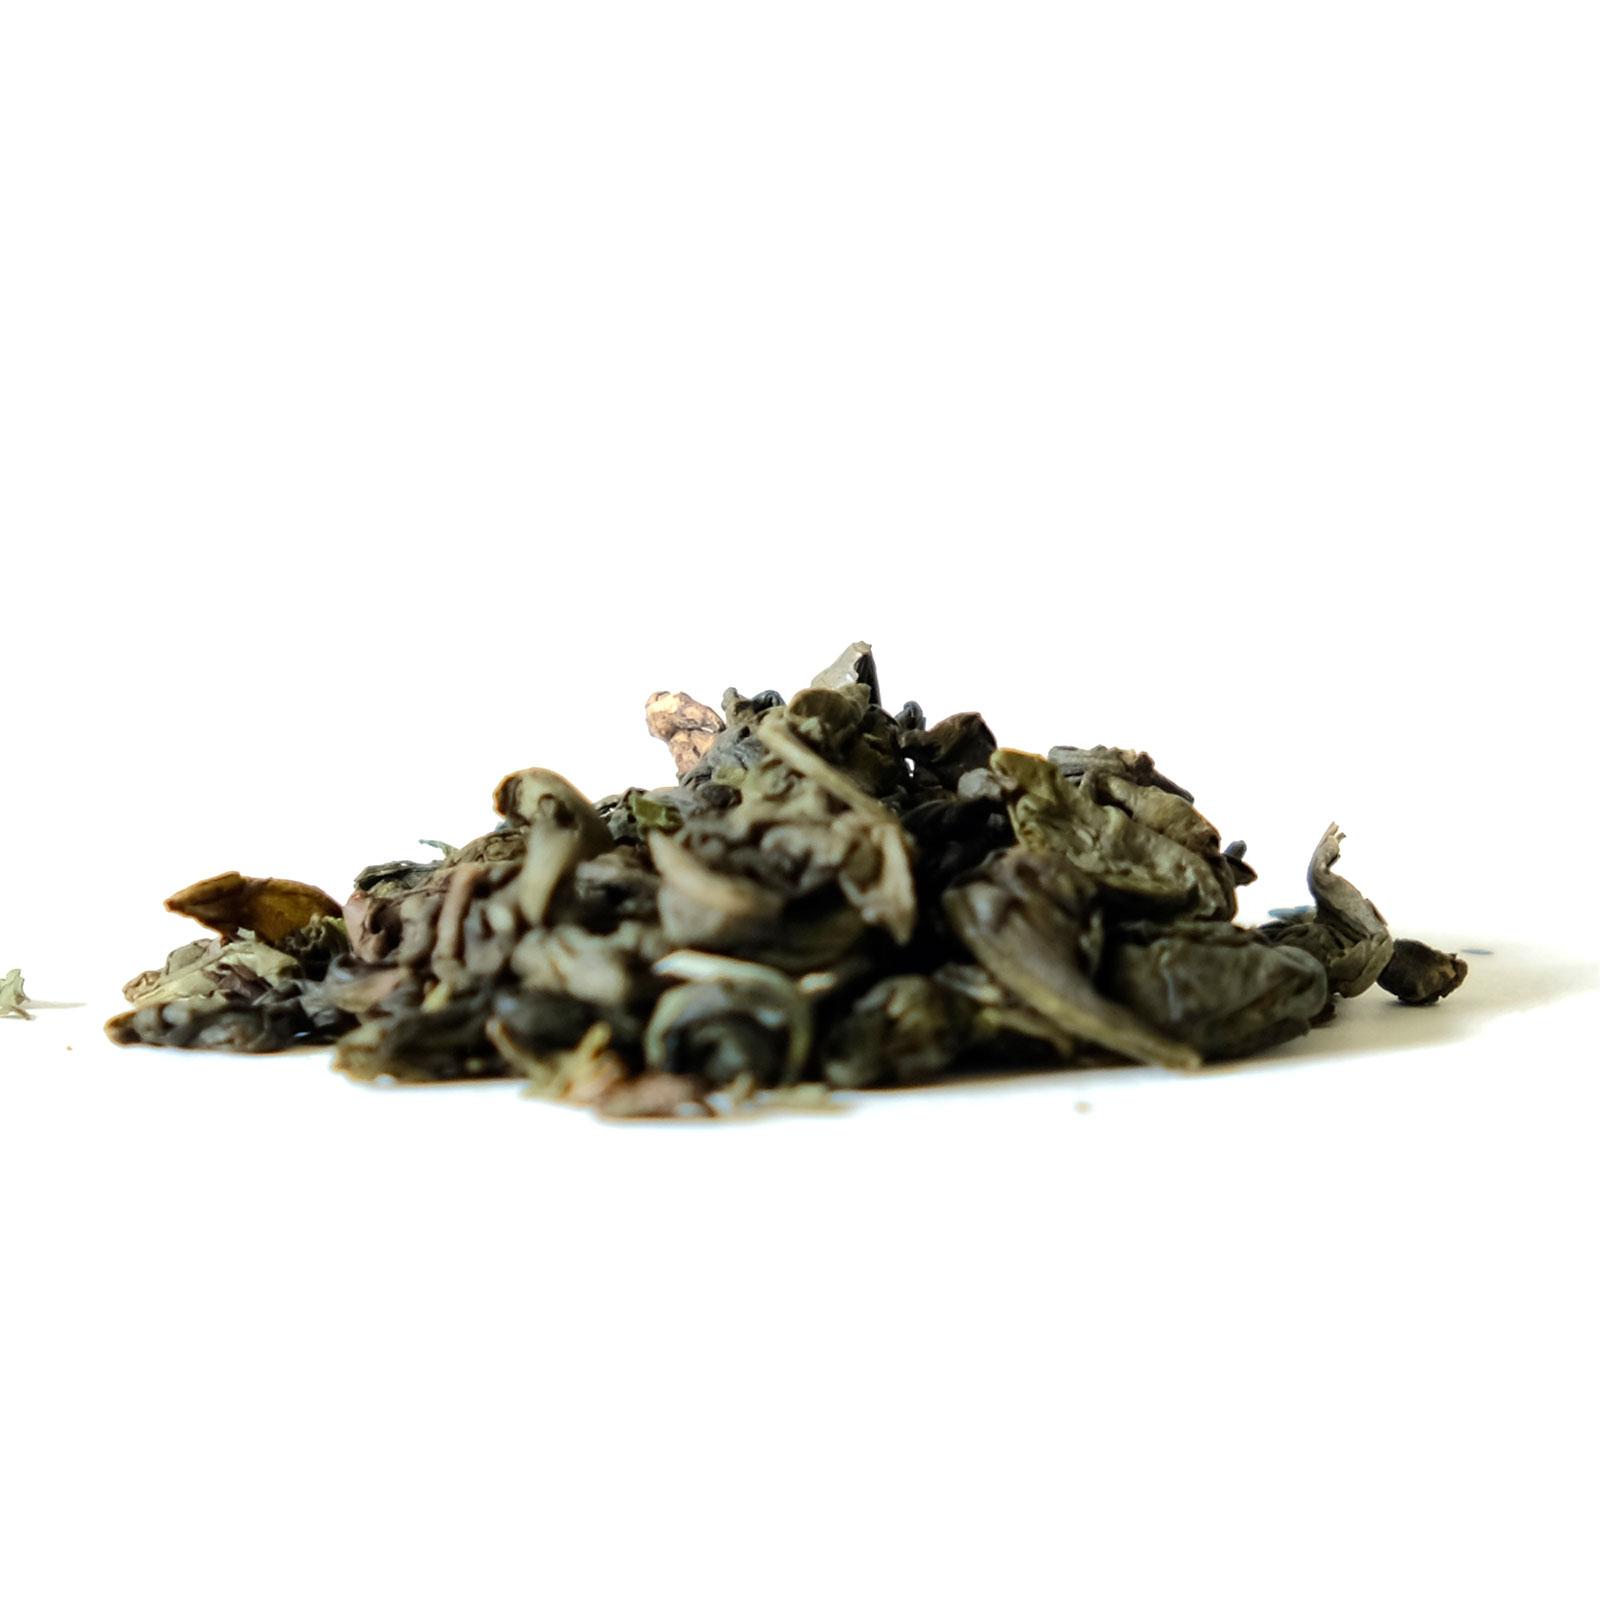 Association feuilles de thé vert et feuilles de menthe